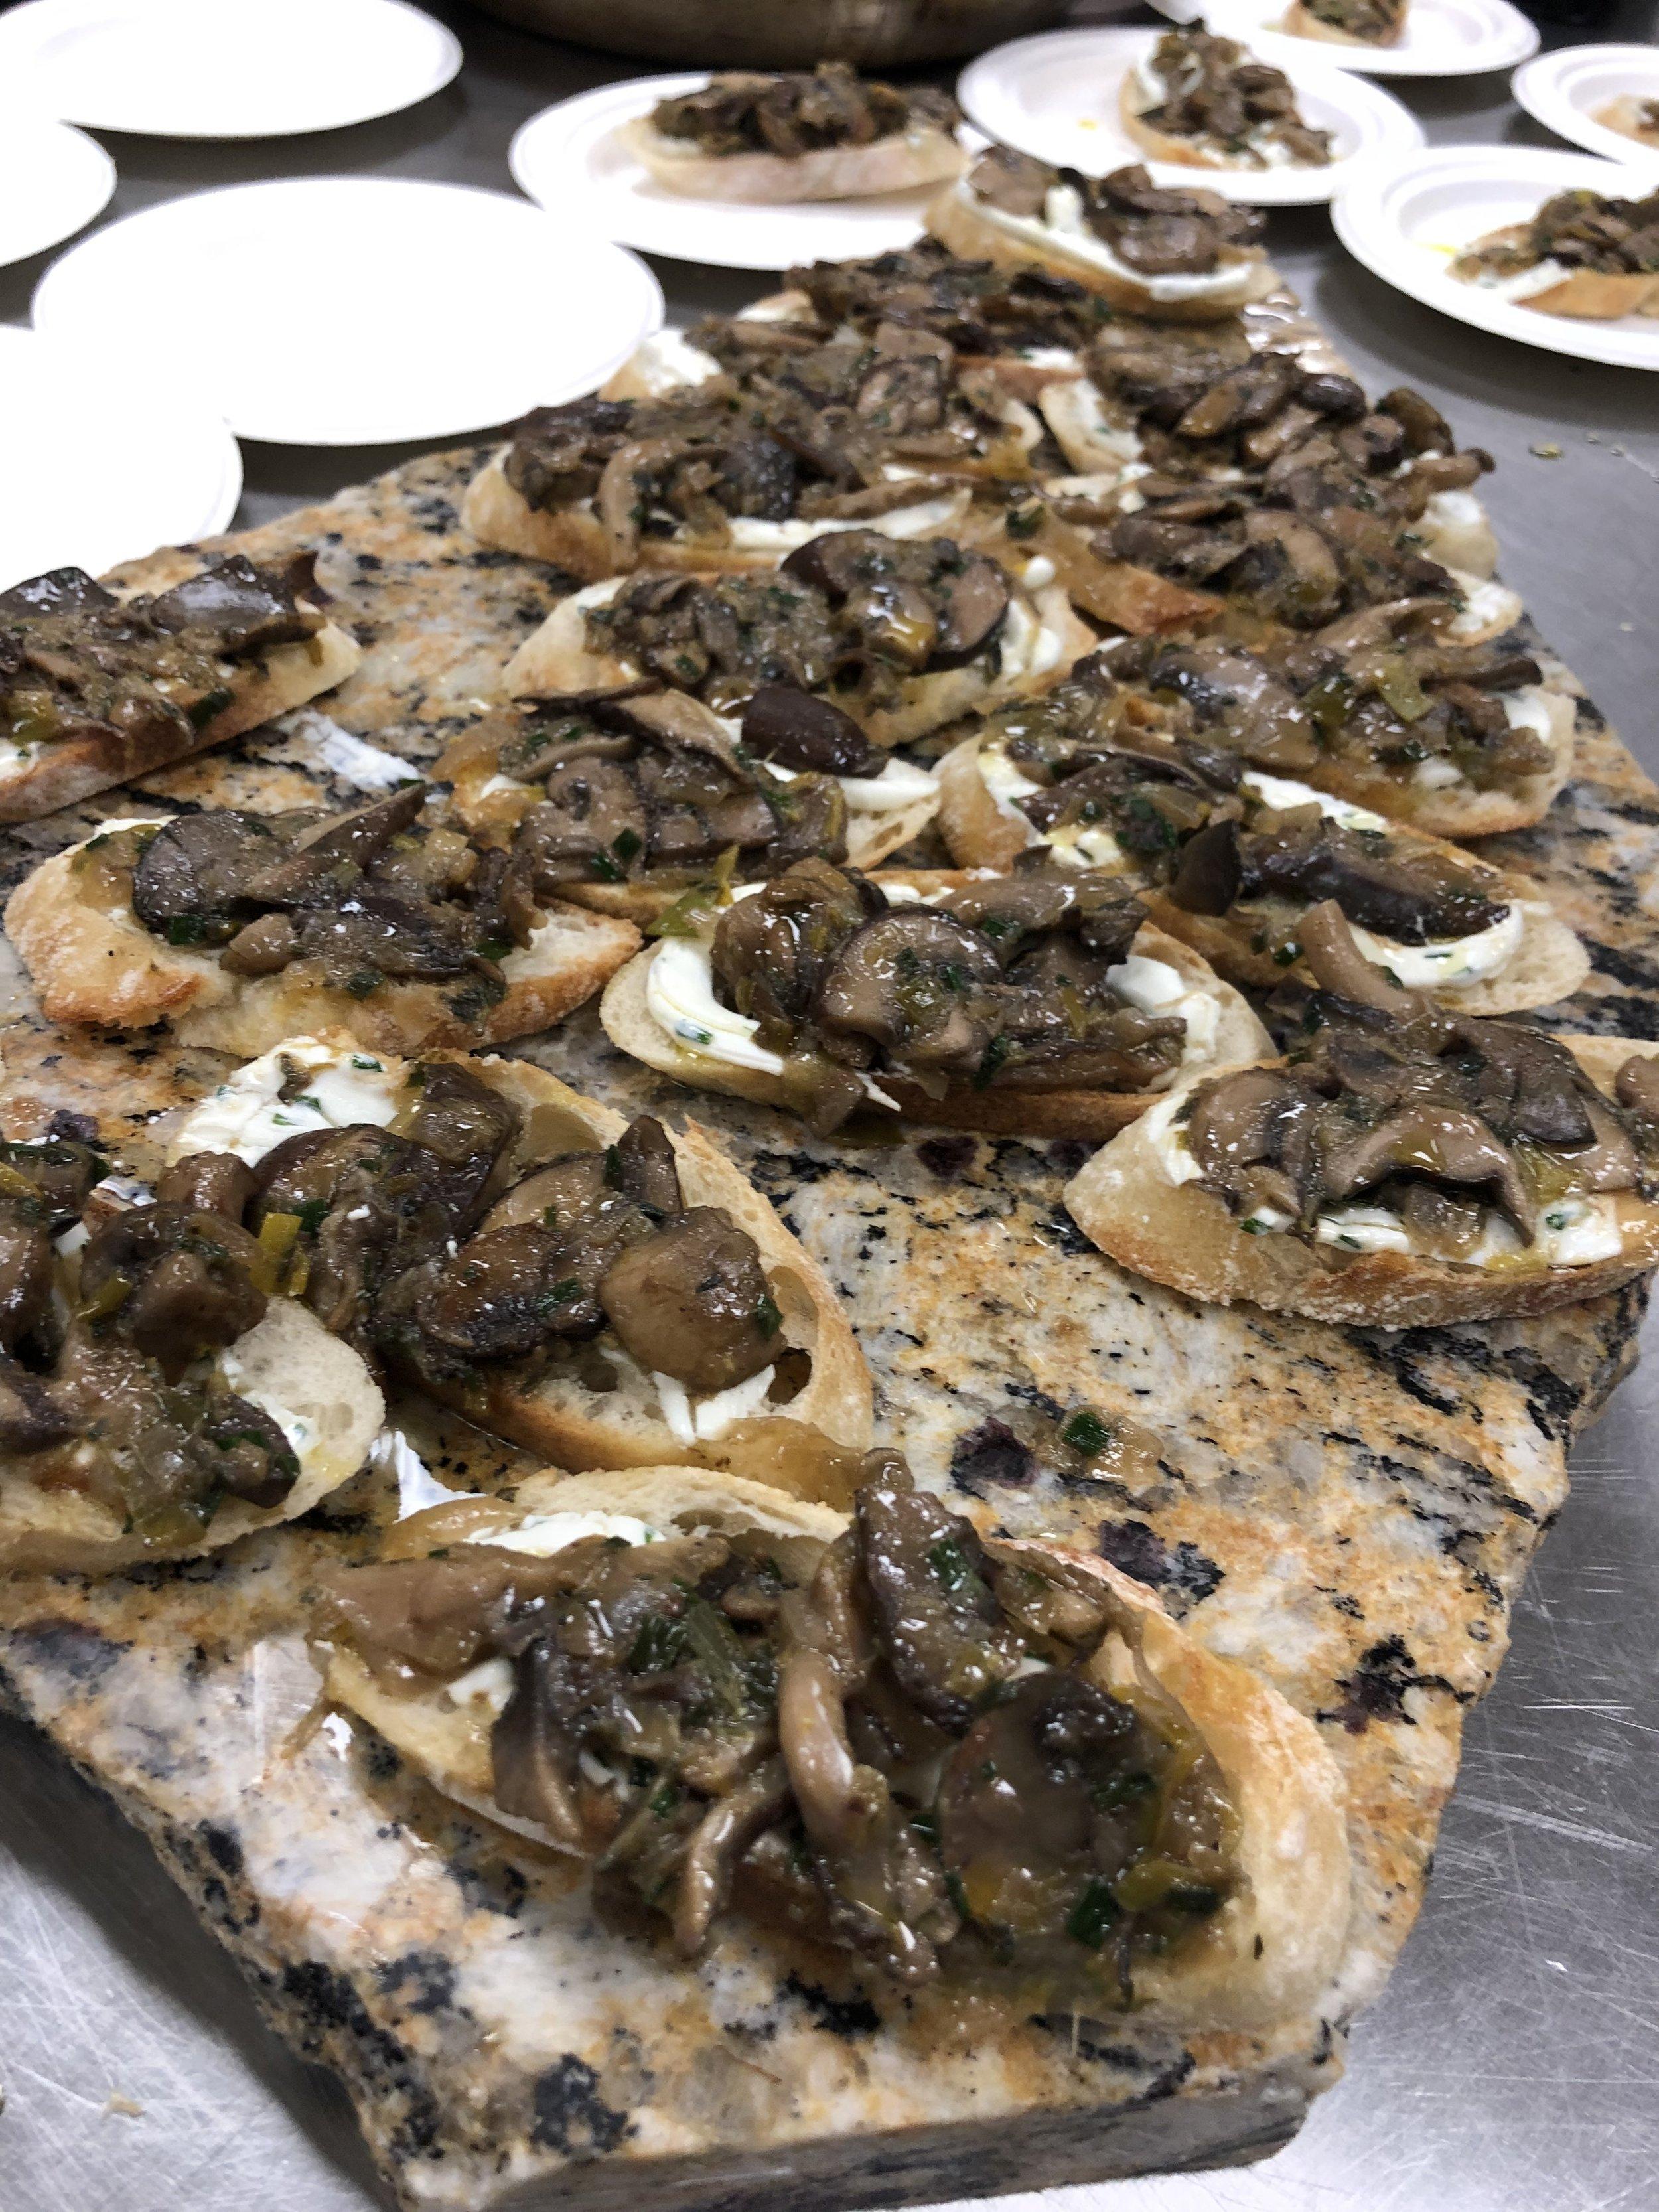 Barberry Lunchbox - Chef Majid AmoorpourWild mushroom and truffle-infused goat cheese crostini